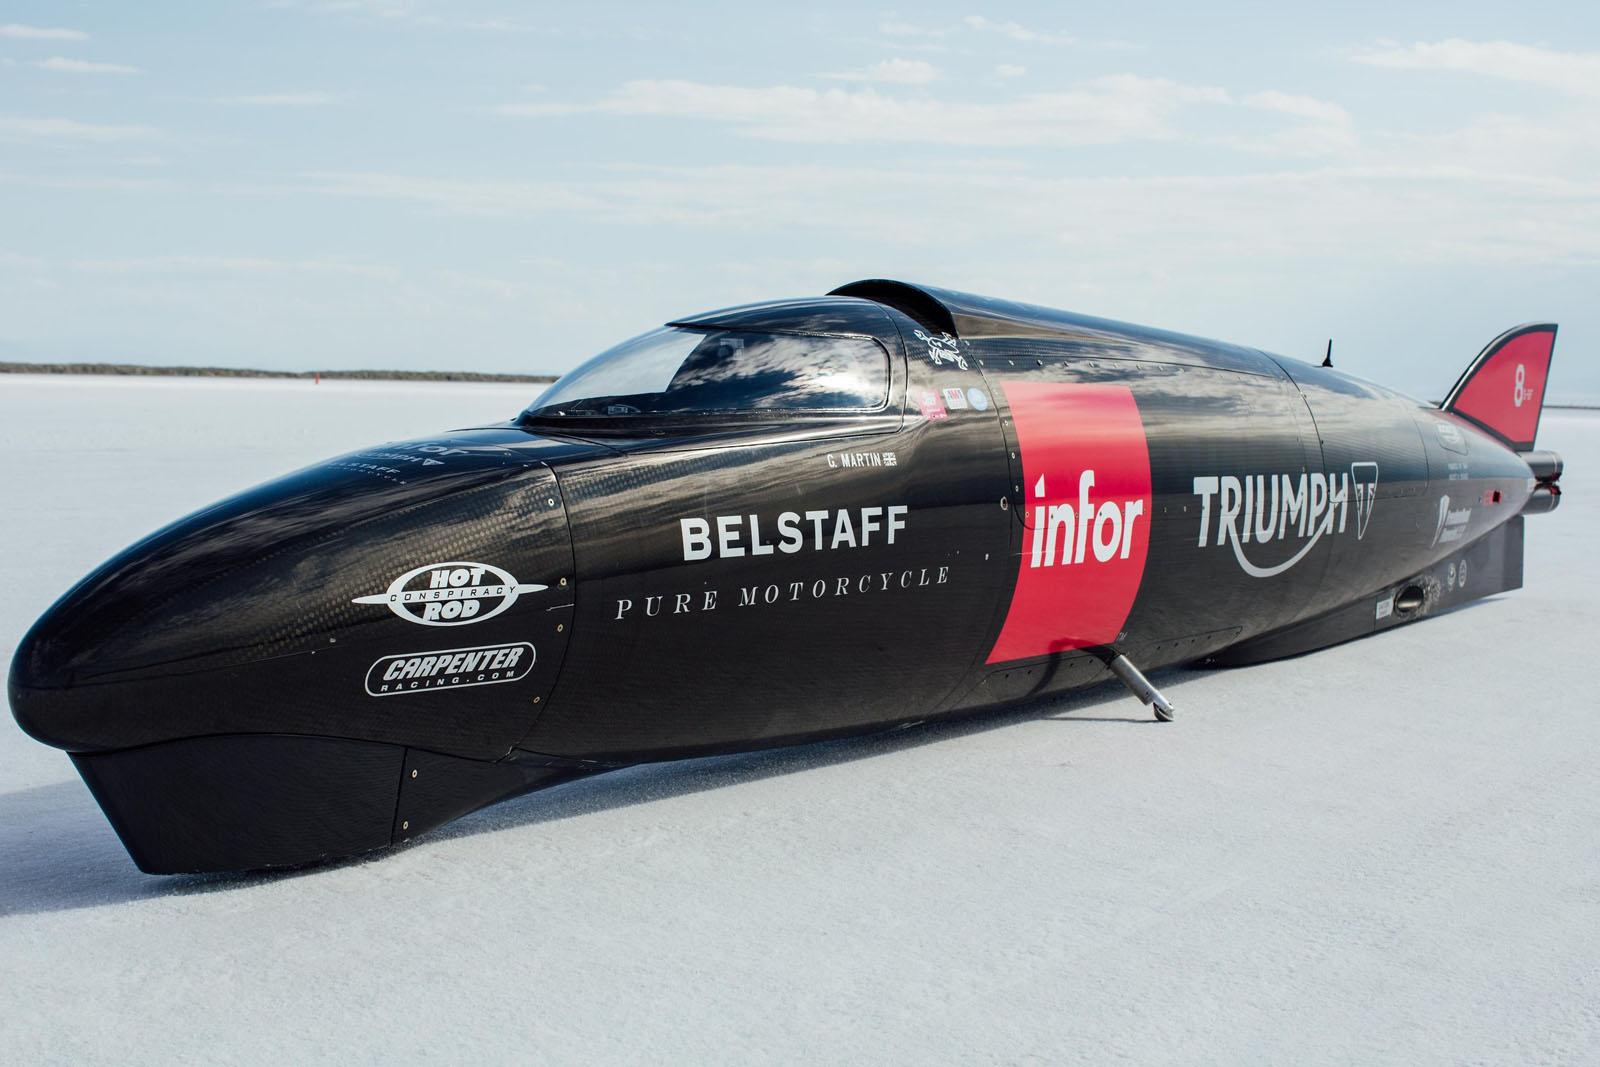 Мотоцикл Triumph Infor Rocket Steamliner разогнался до441 км/ч